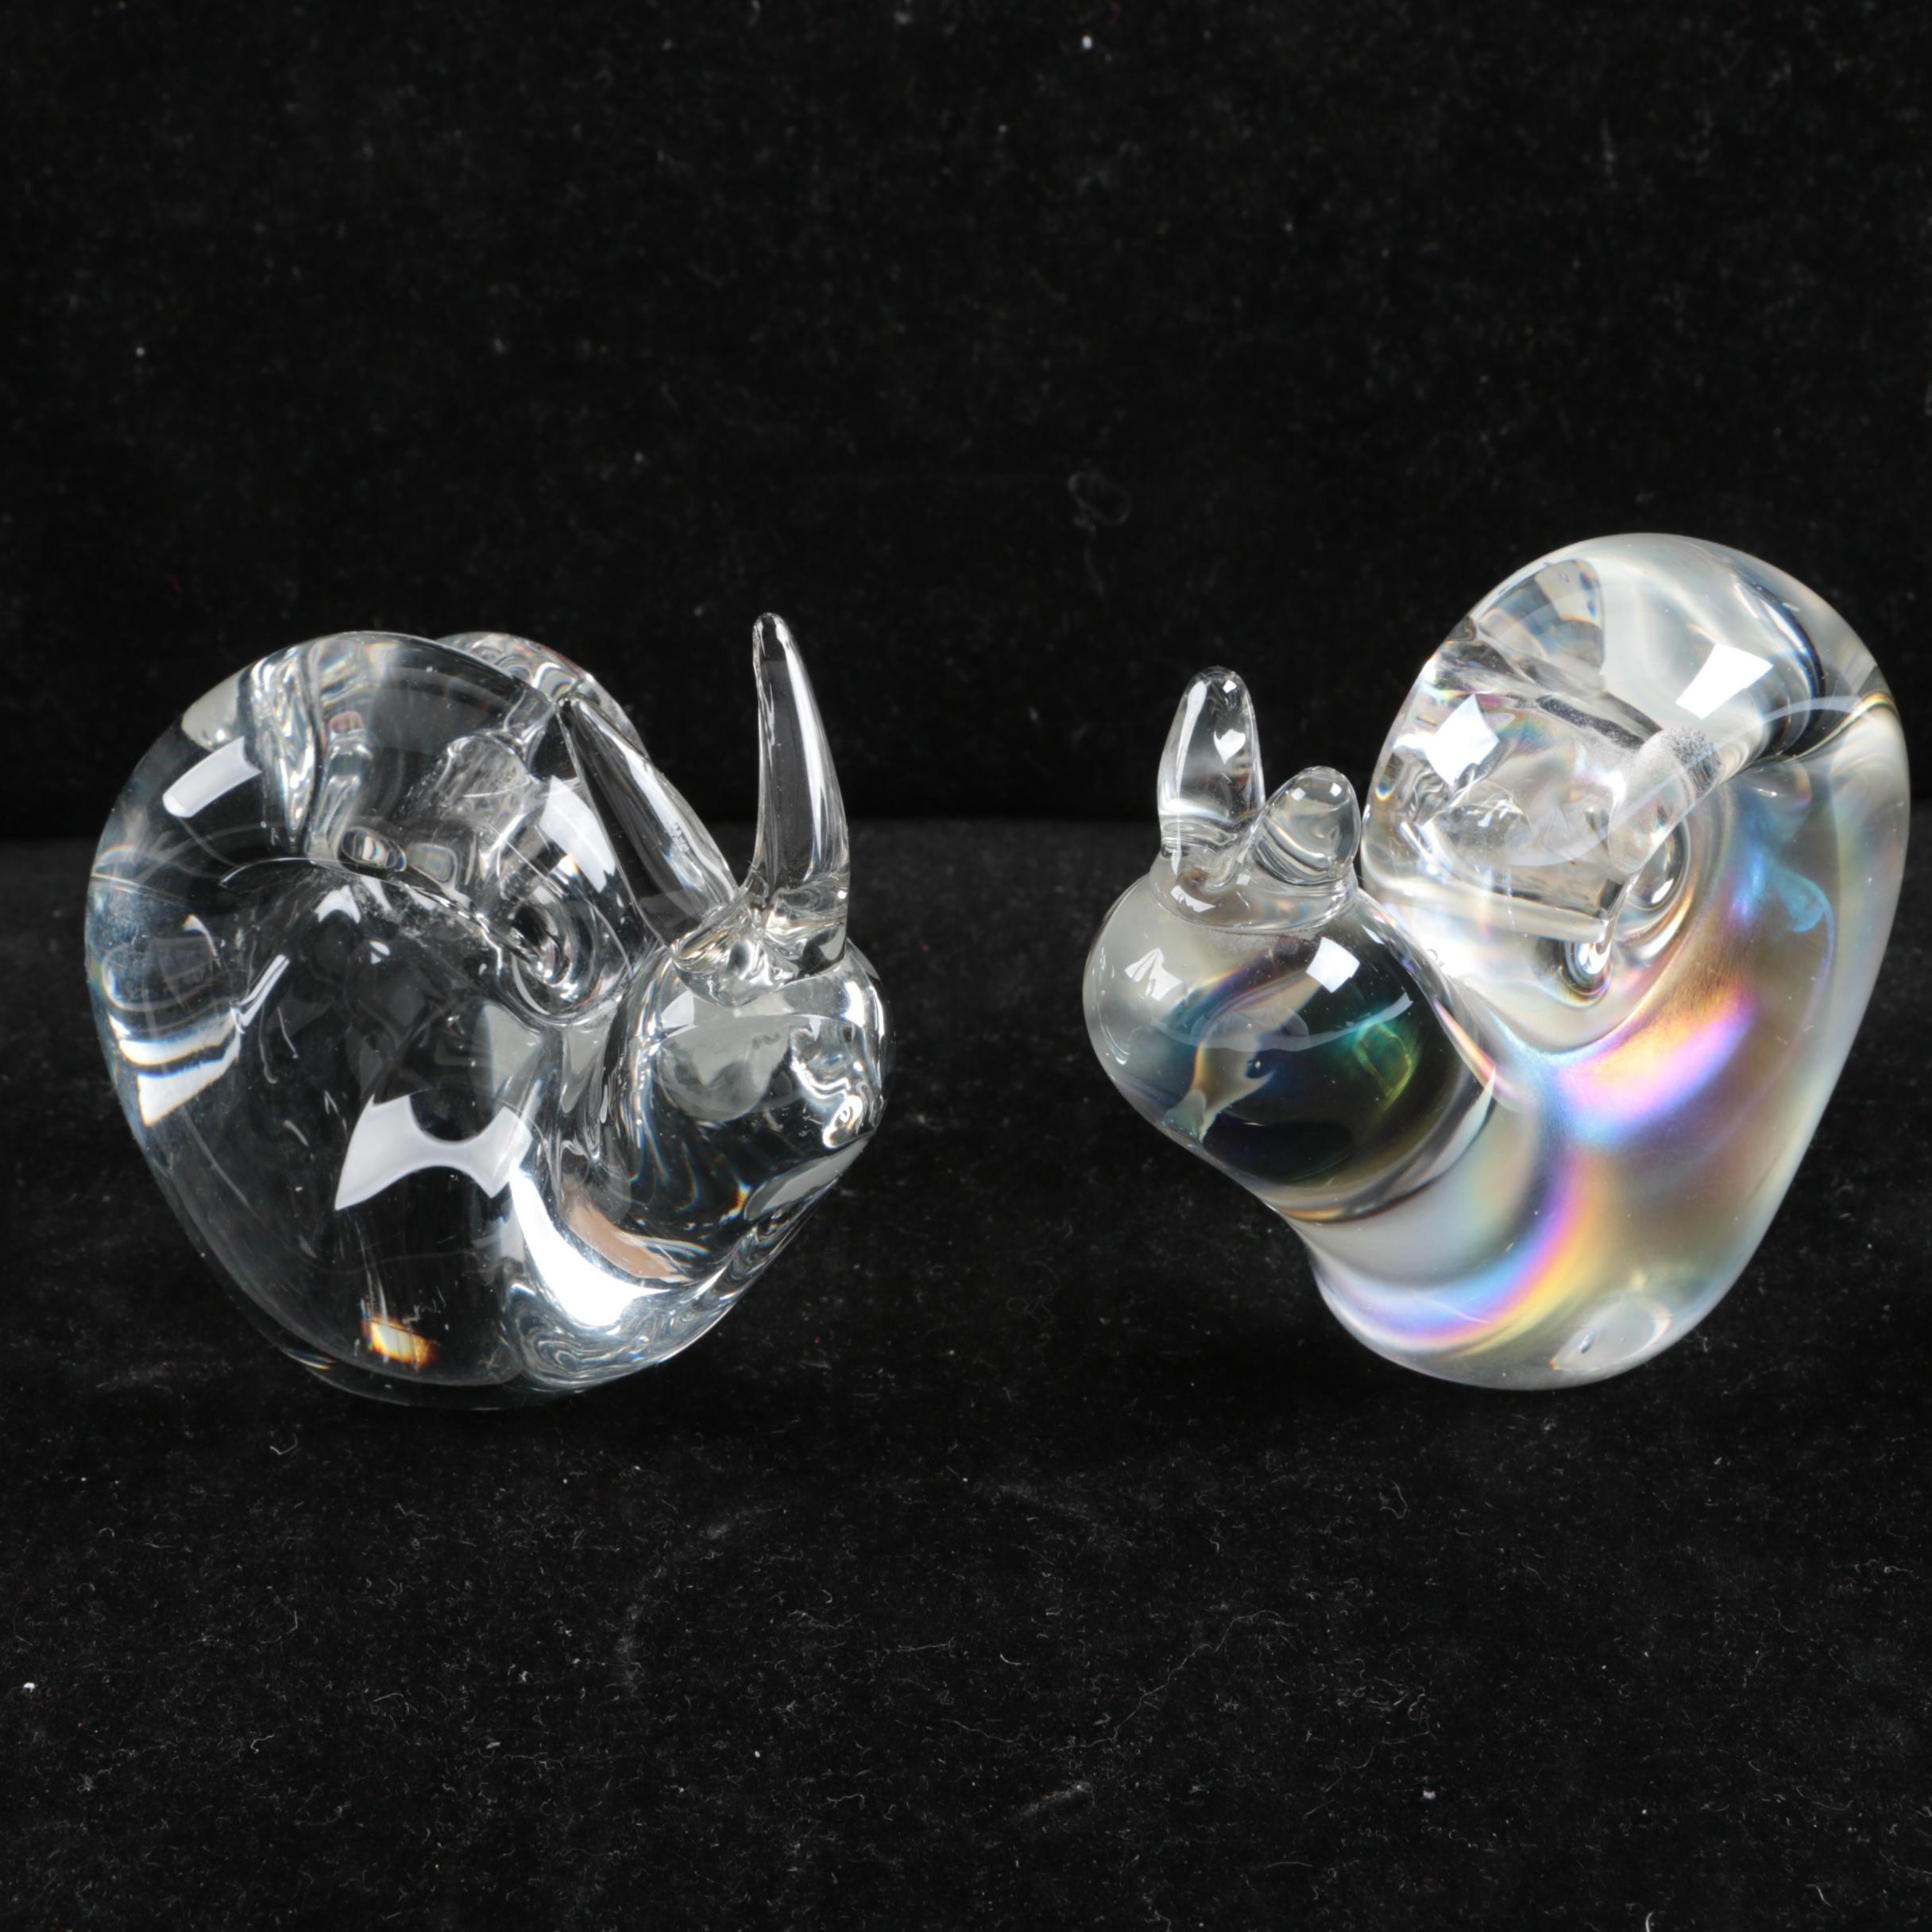 Pair of Crystal Snail Figurines